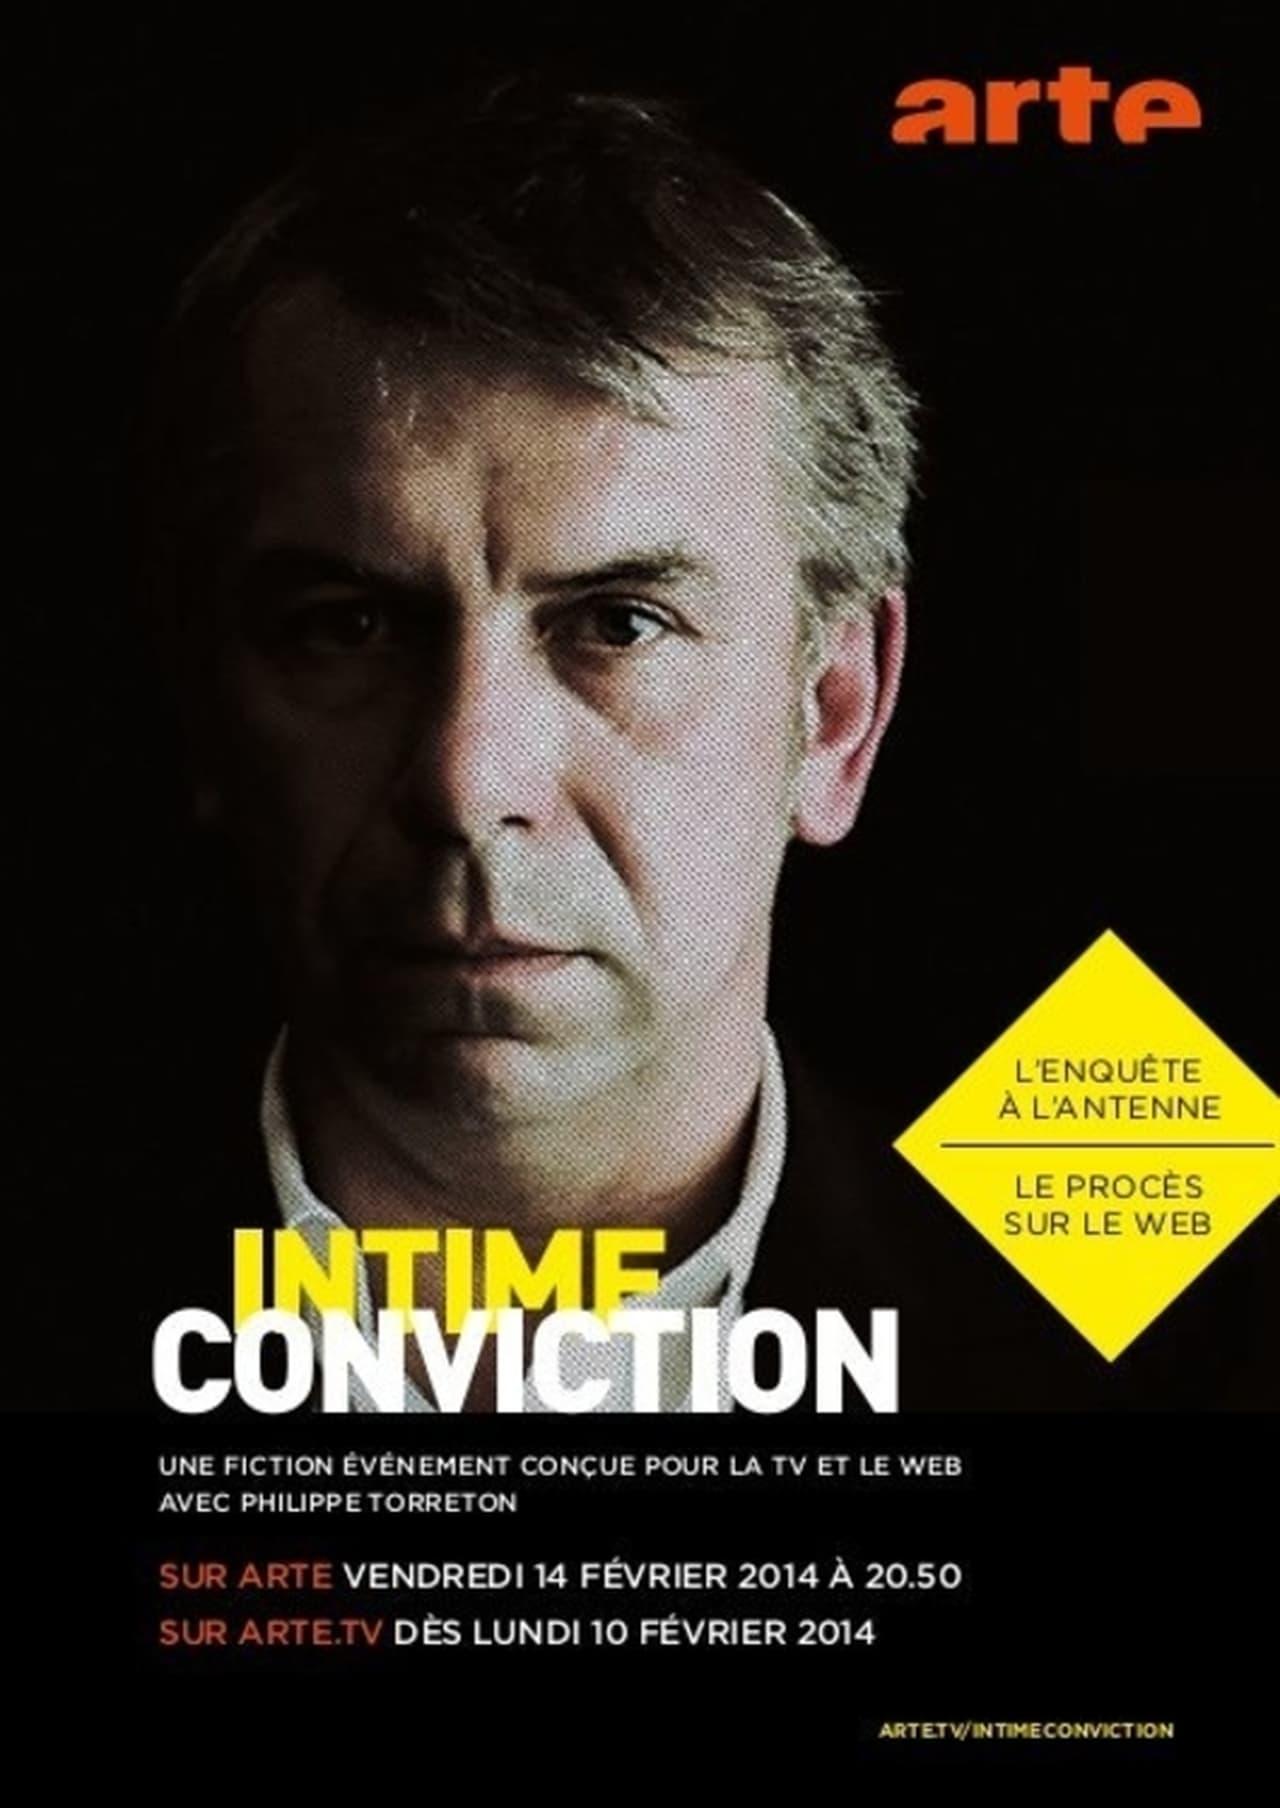 Intime Conviction